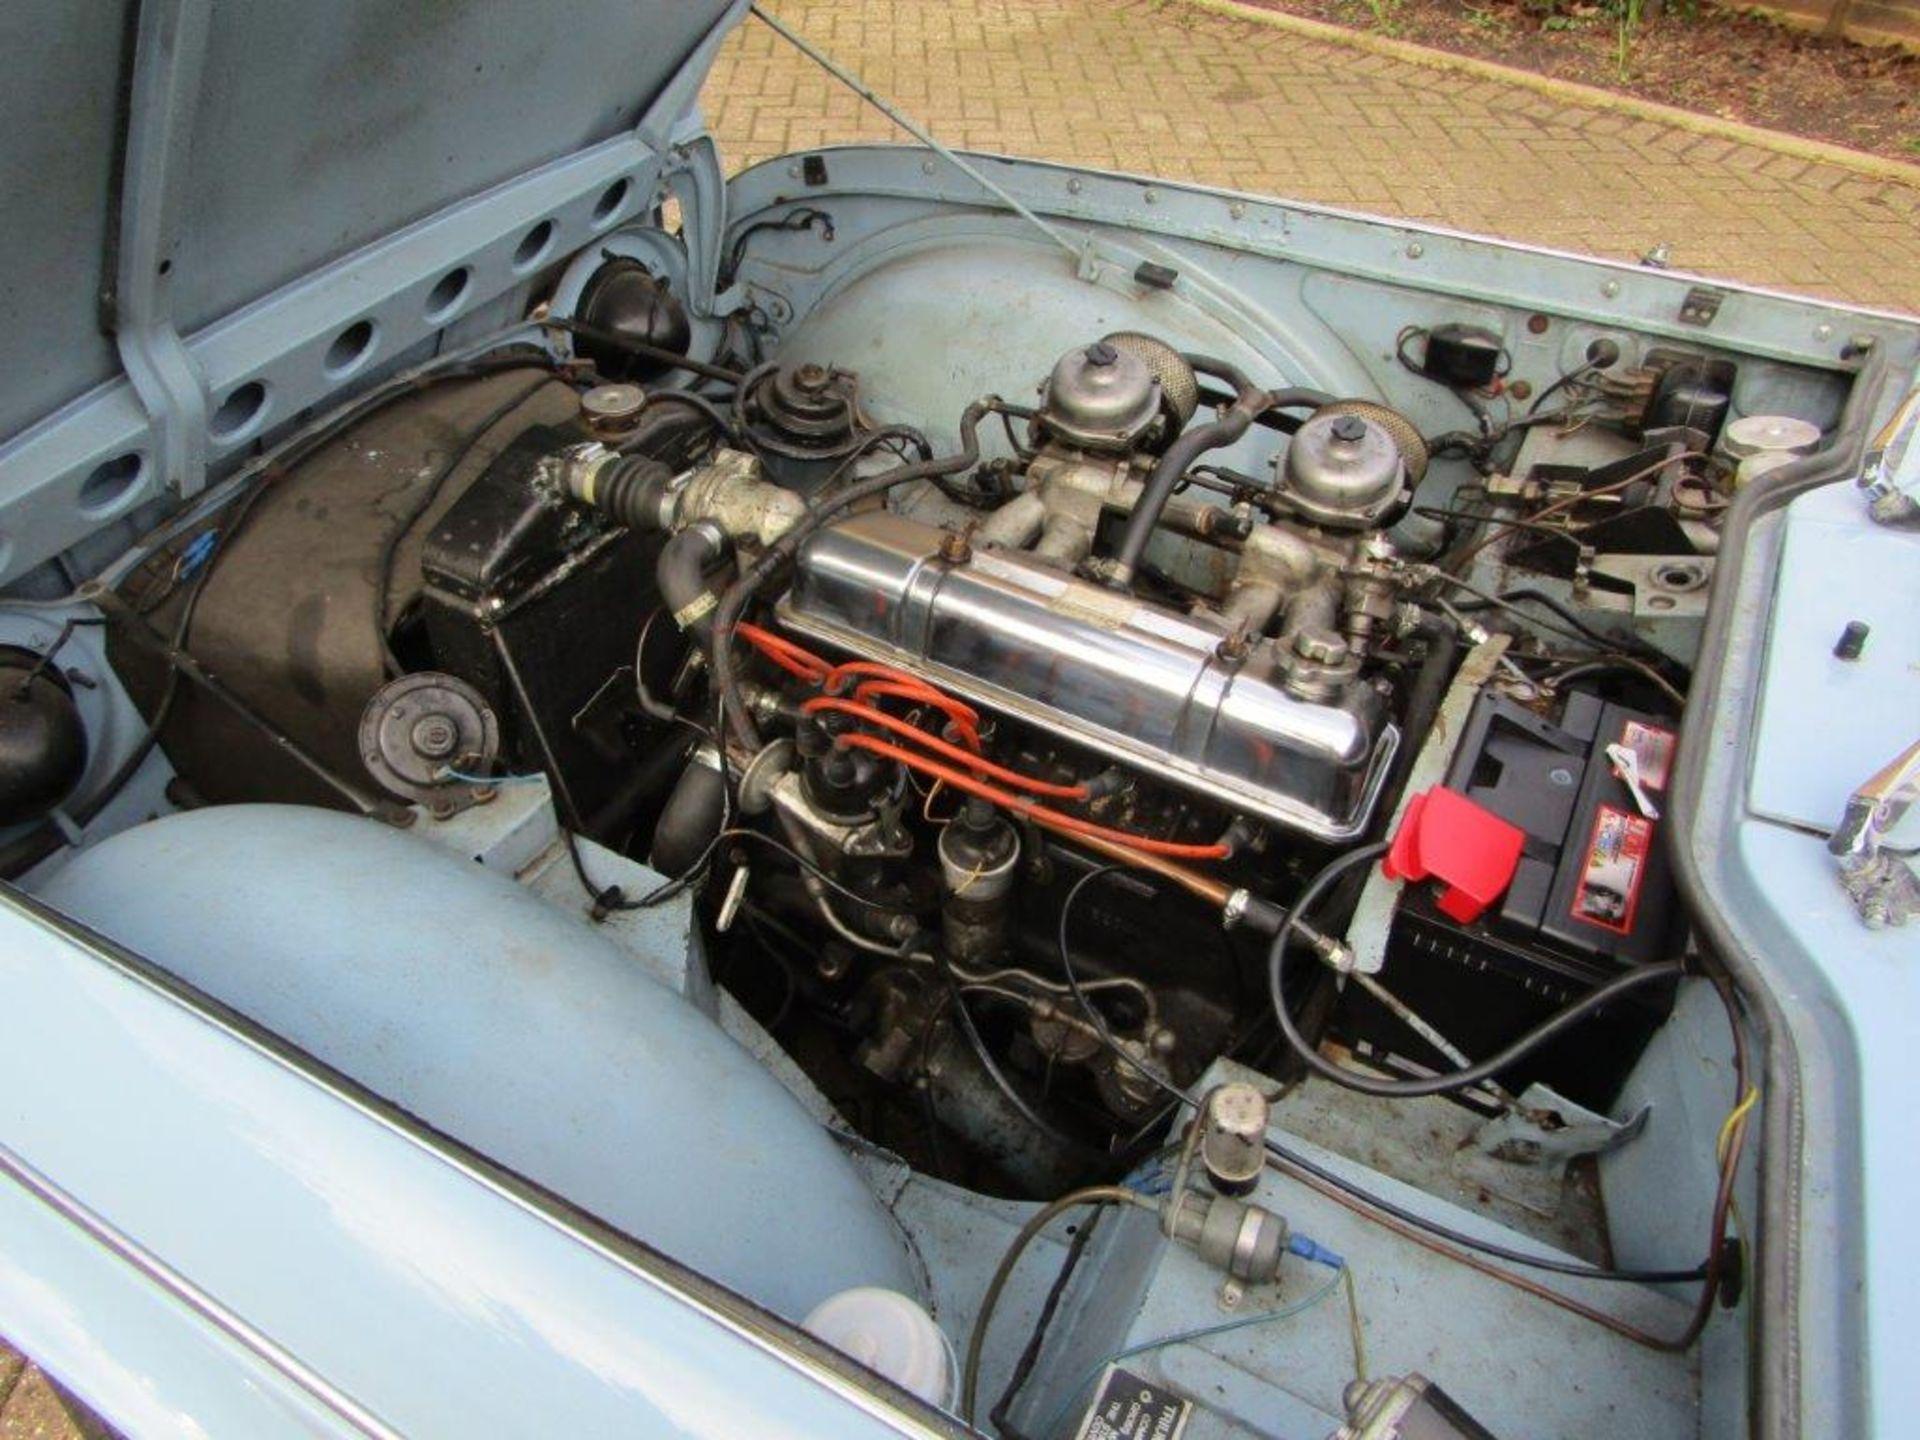 1965 Triumph TR4 - Image 11 of 17